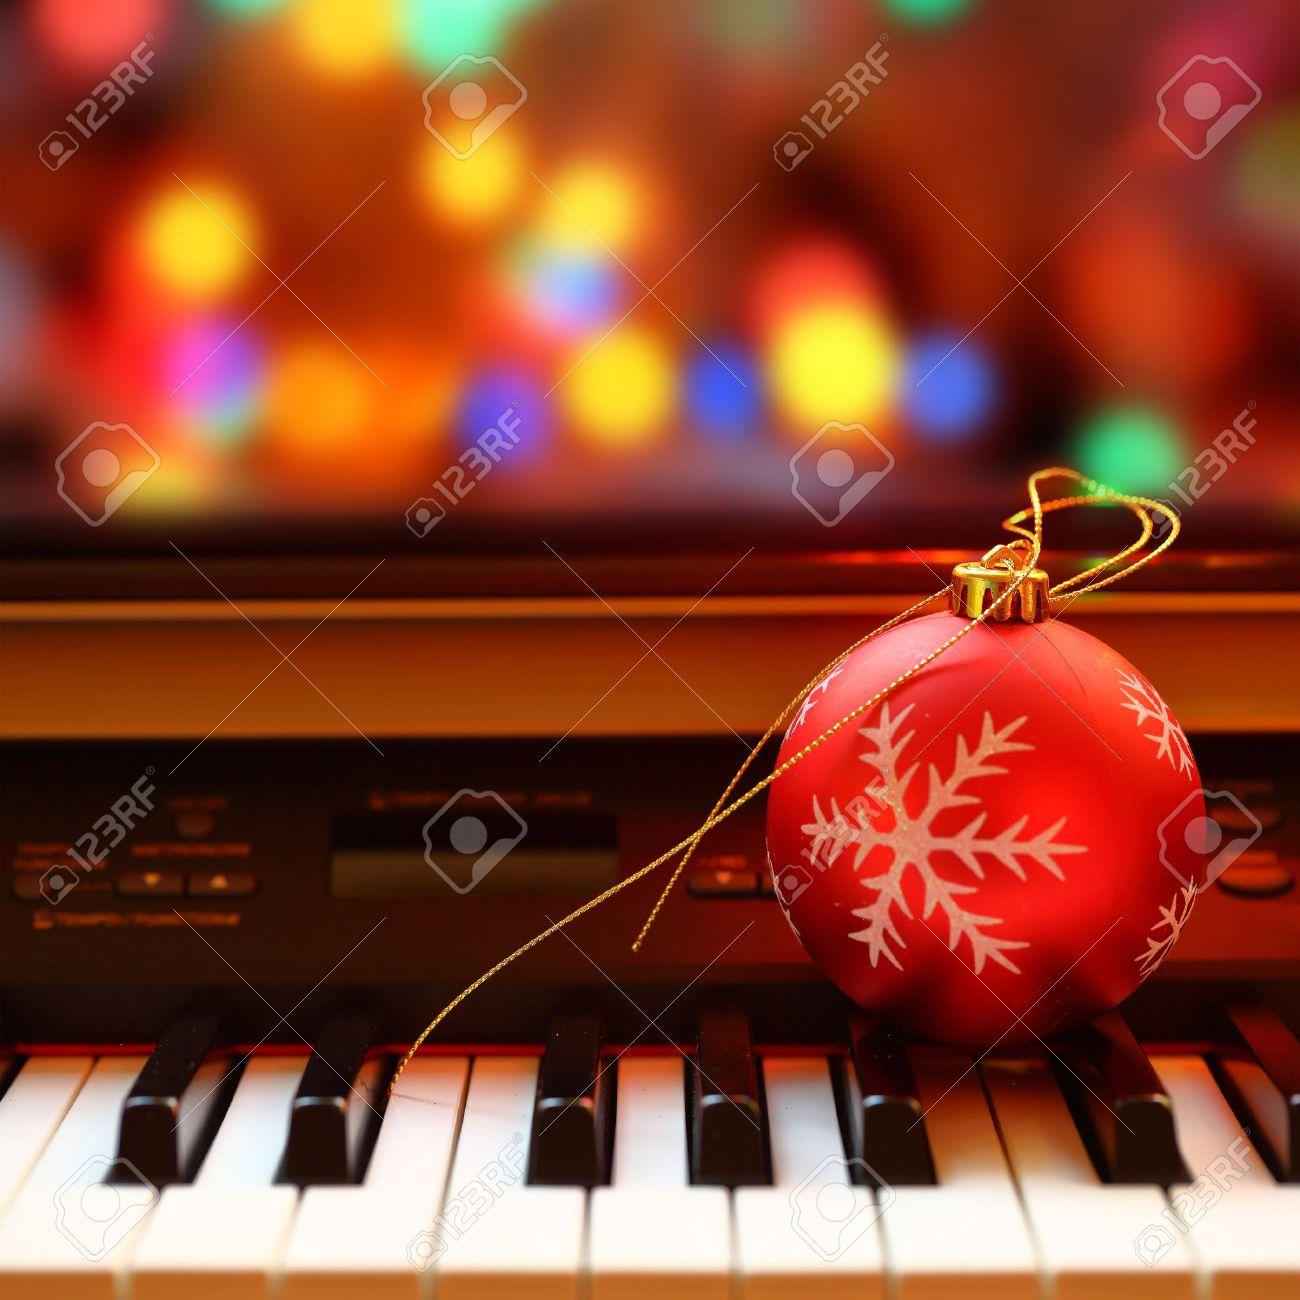 Christmas ball on piano keys Stock Photo - 33267778